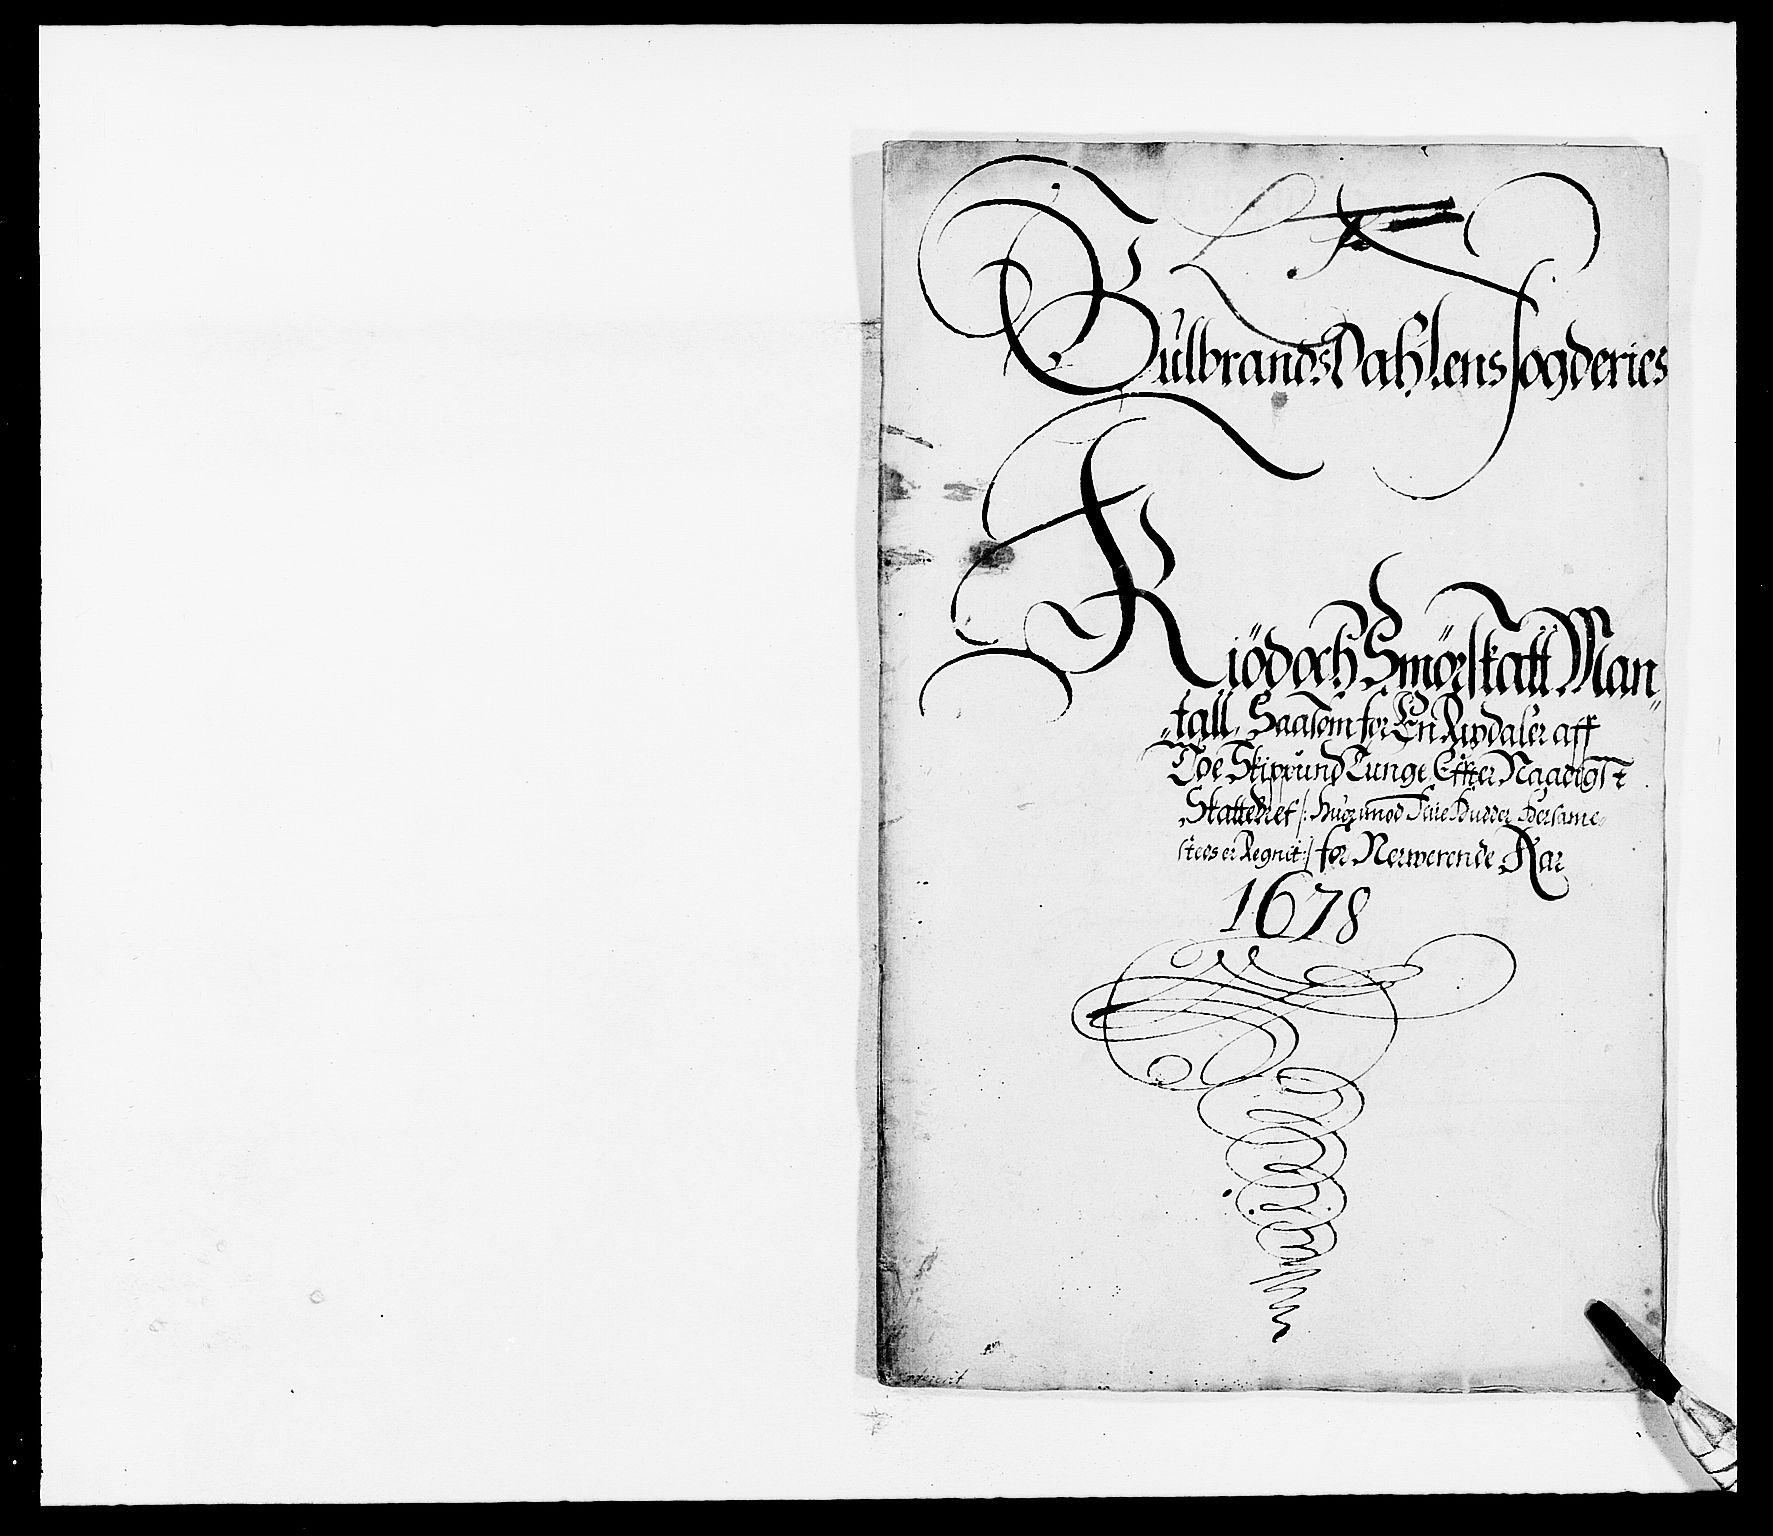 RA, Rentekammeret inntil 1814, Reviderte regnskaper, Fogderegnskap, R17/L1152: Fogderegnskap Gudbrandsdal, 1678-1679, s. 257